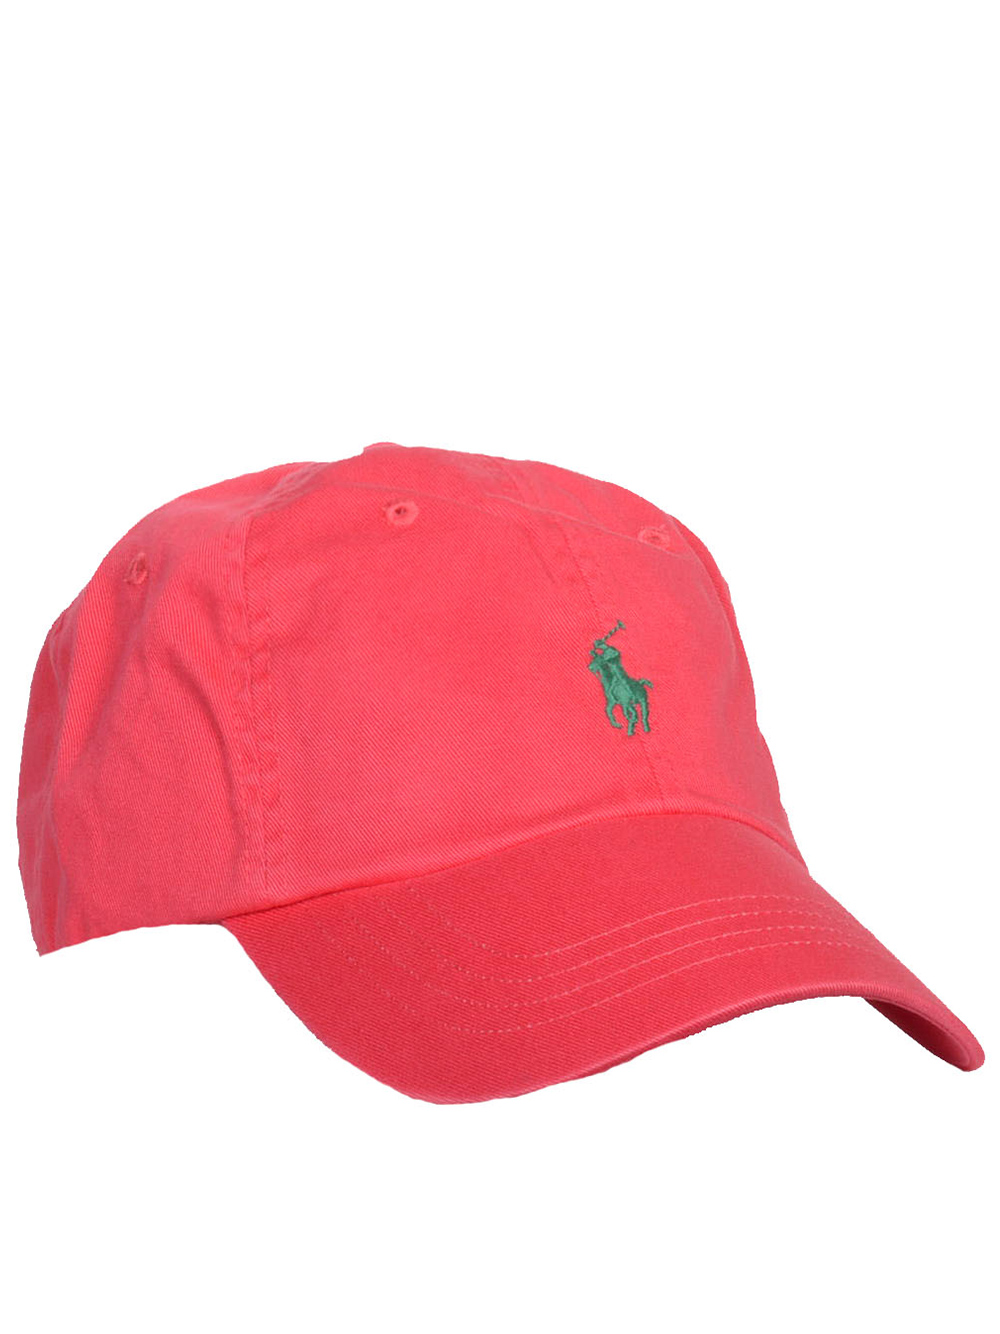 POLO RALPH LAUREN Καπέλο jockey 710667709013 ΚΟΚΚΙΝΟ